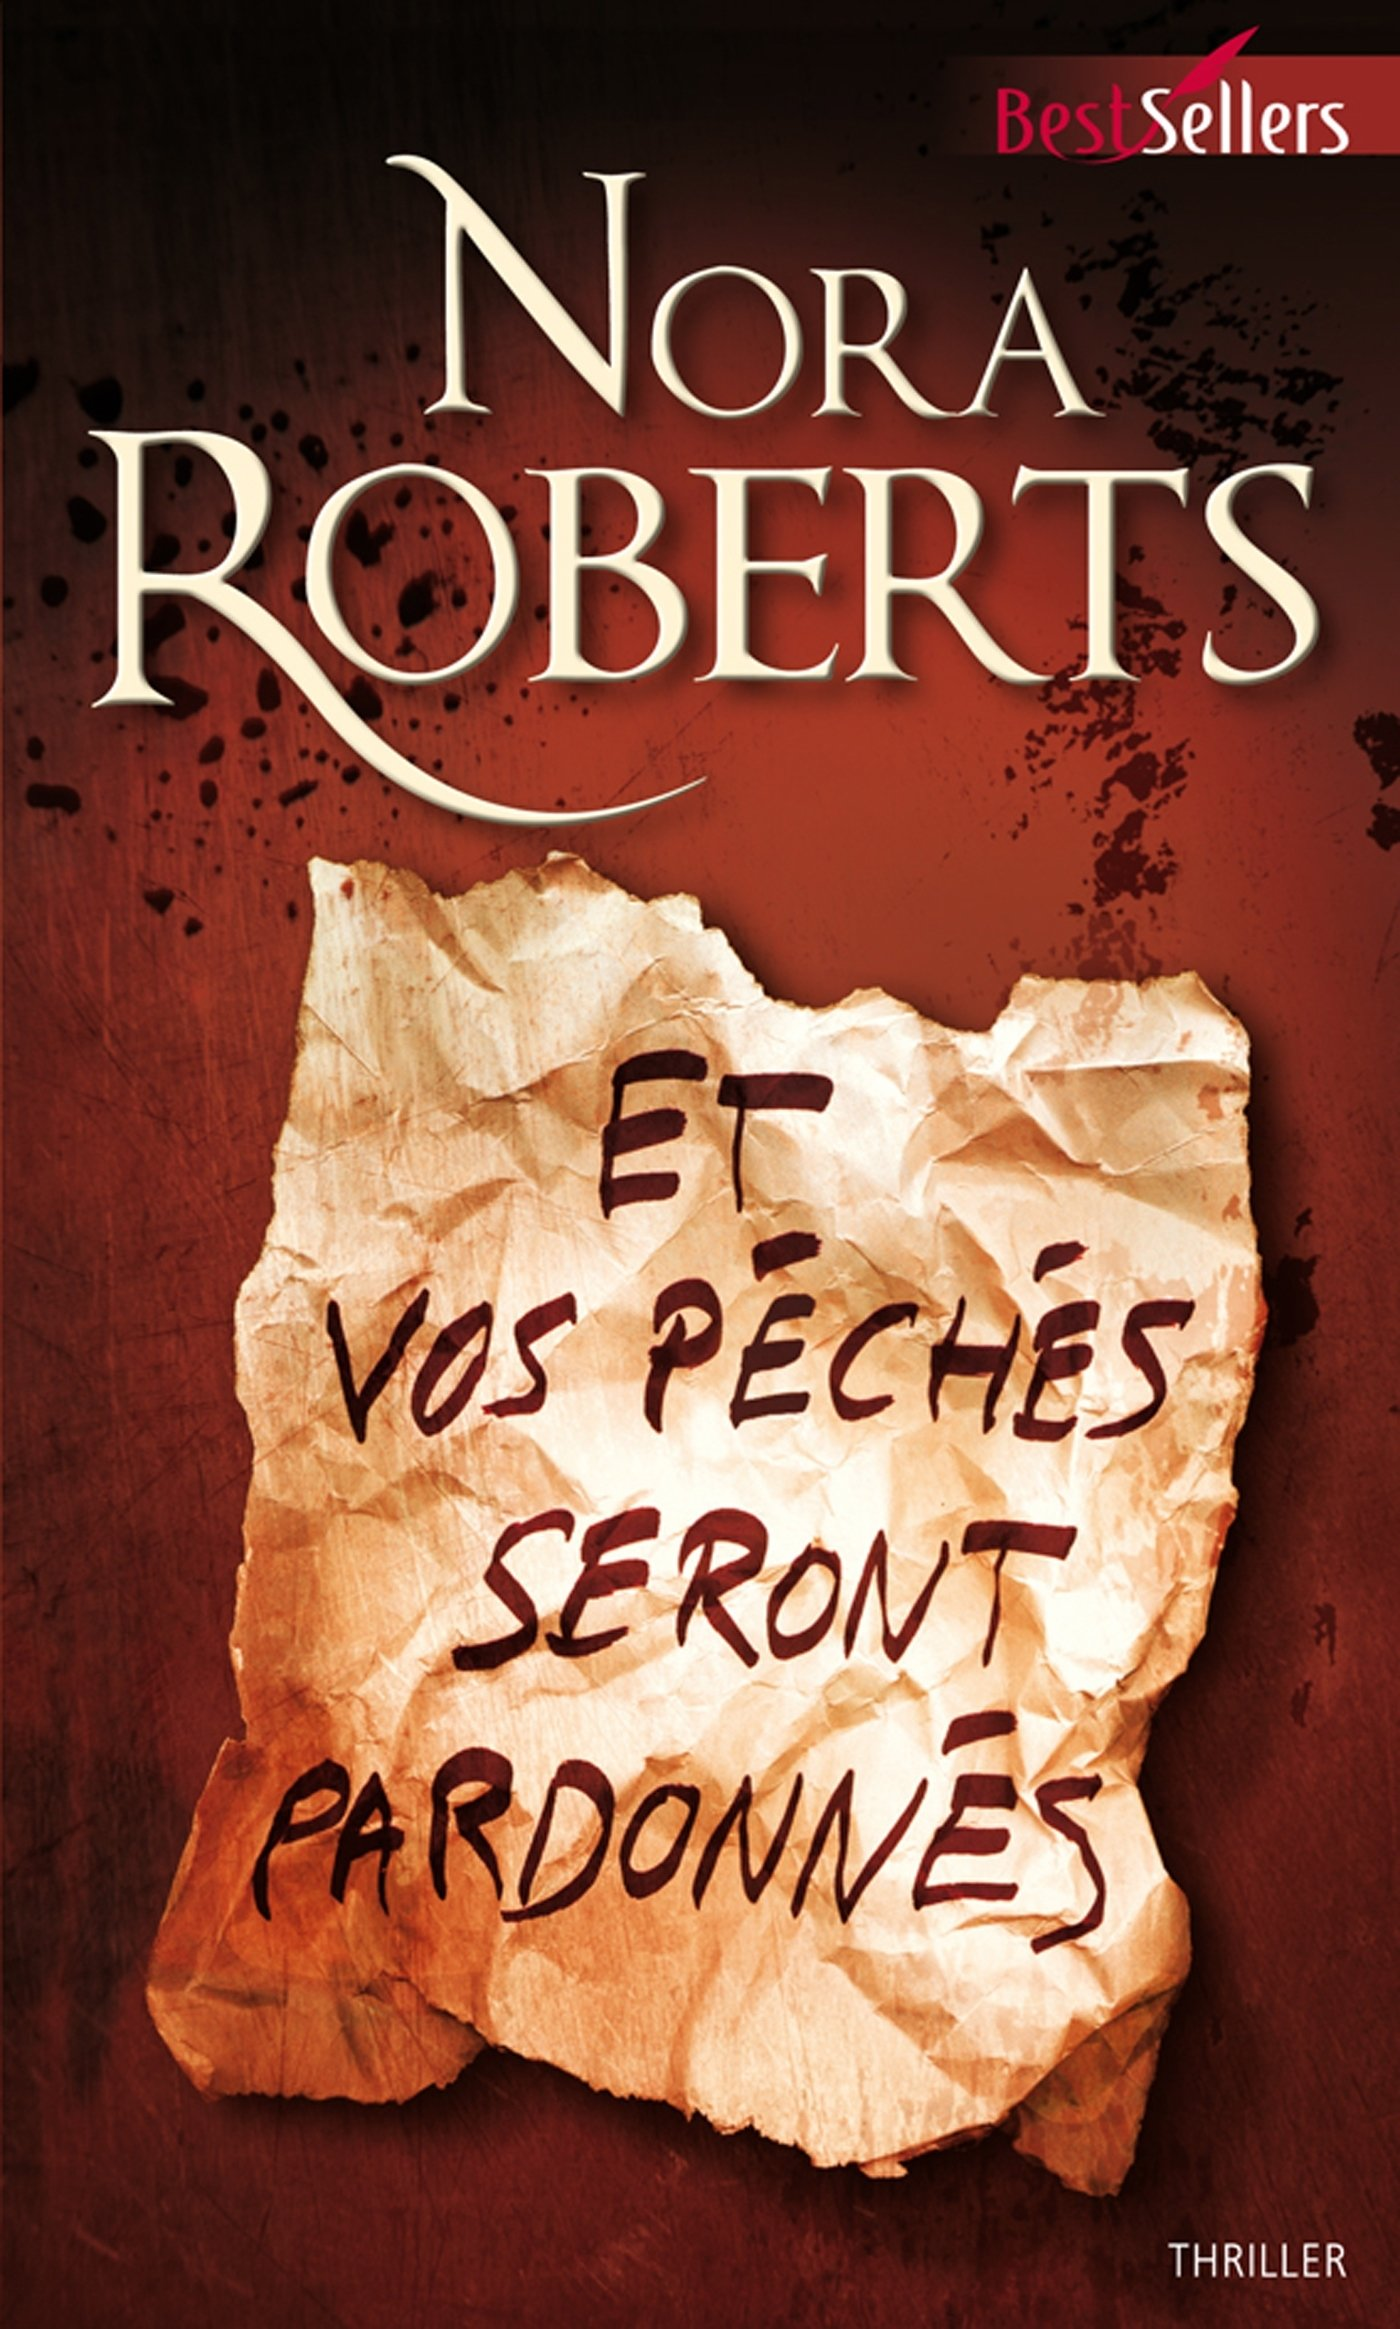 Et vos péchés seront pardonnés - Nora Roberts